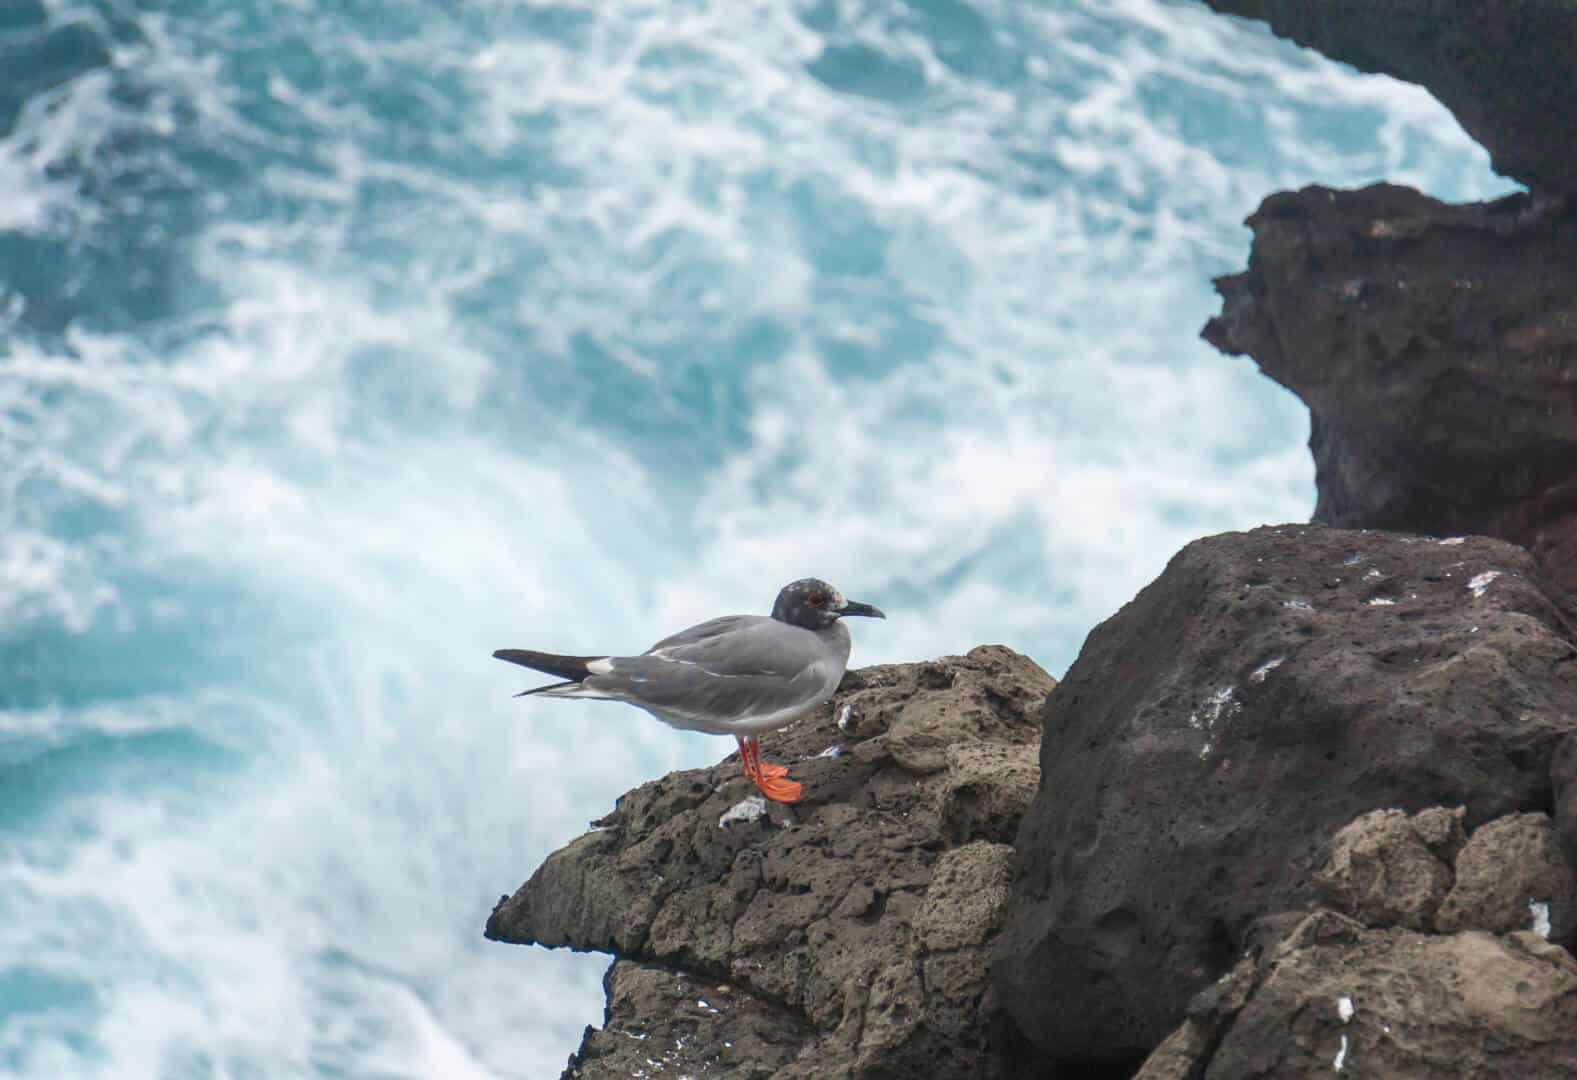 Cliff on San Cristobal island in the galaoagos